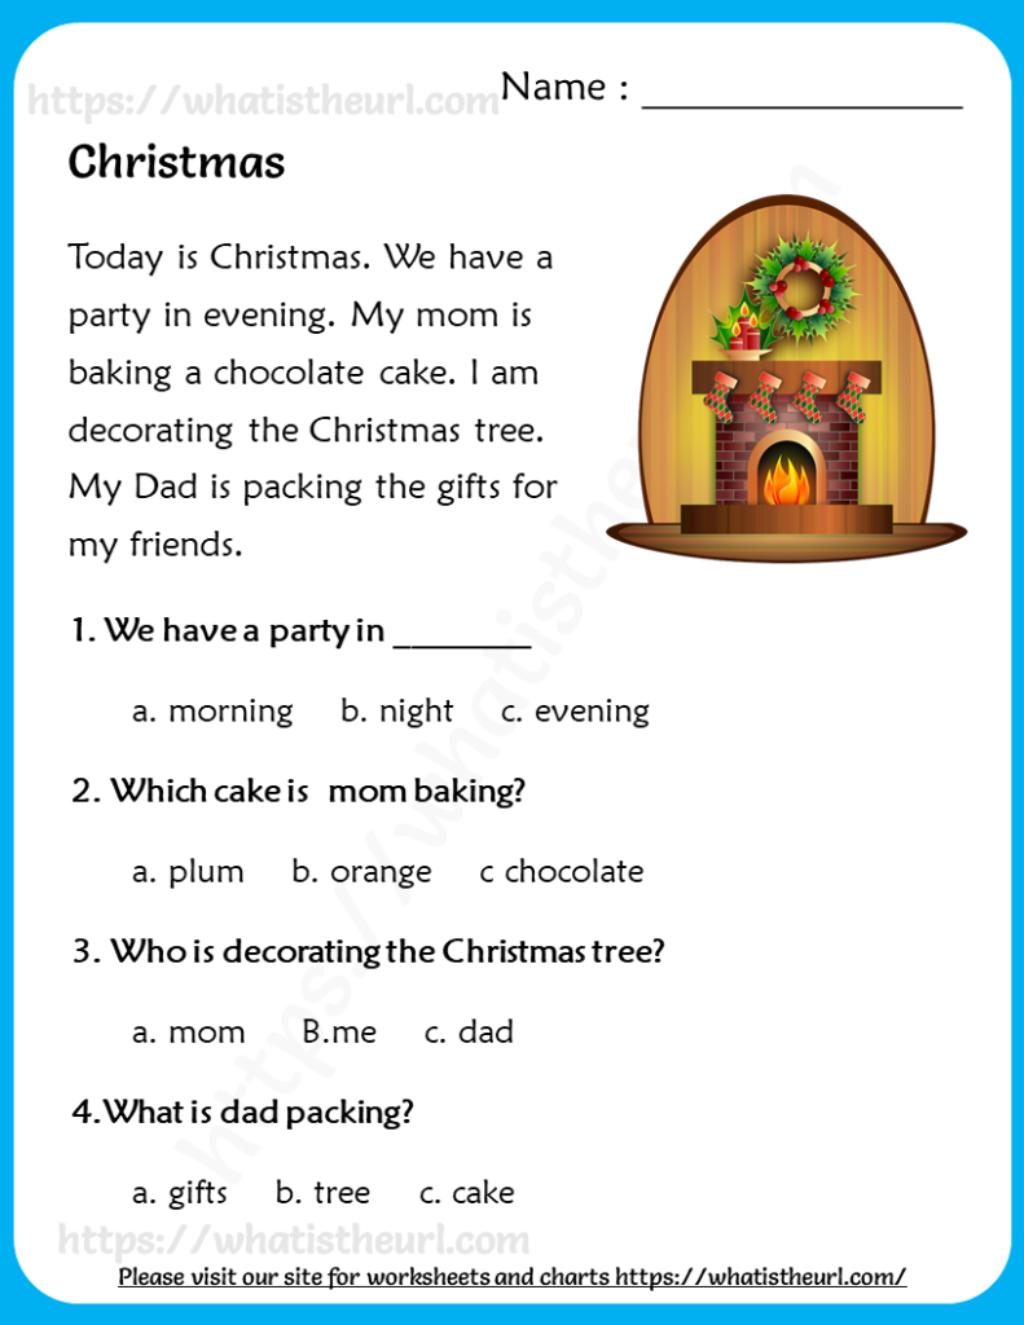 Christmas Reading Comprehension For Grade 3 Christmas Reading Comprehension Christmas Reading Reading Comprehension [ 1325 x 1024 Pixel ]